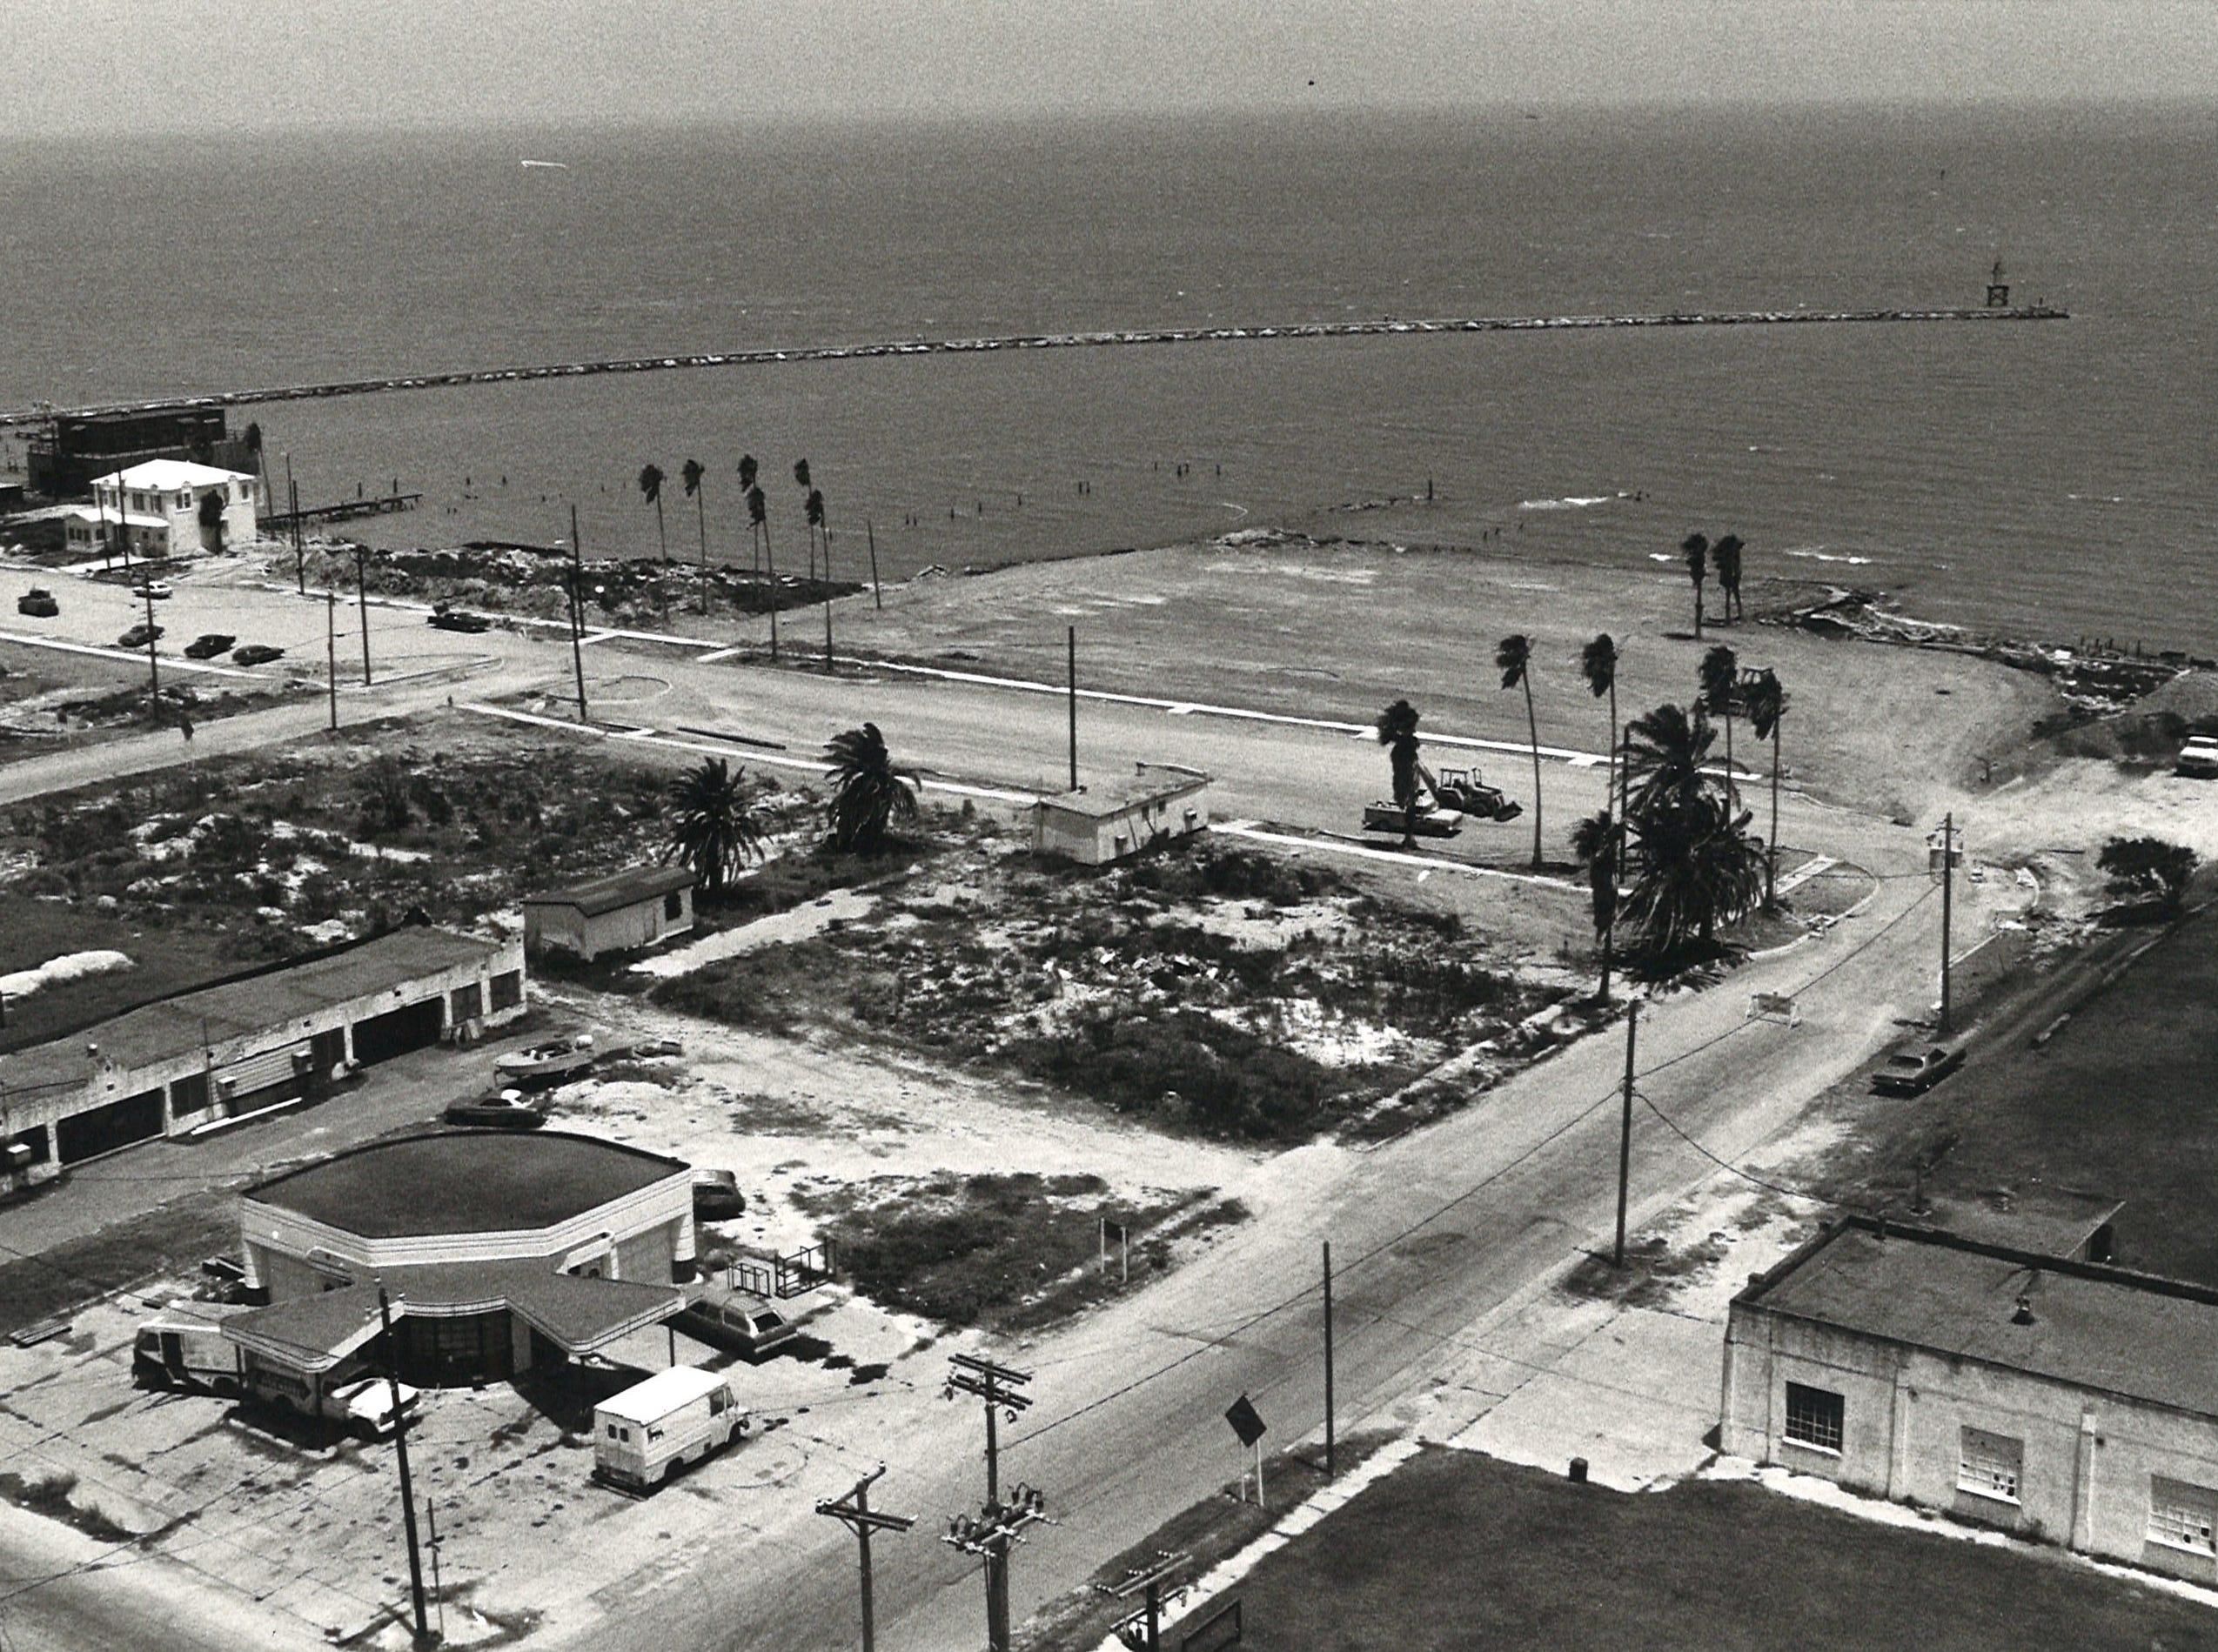 Corpus Christi's North Beach, as seen from the Harbor Bridge, on July 19, 1982.